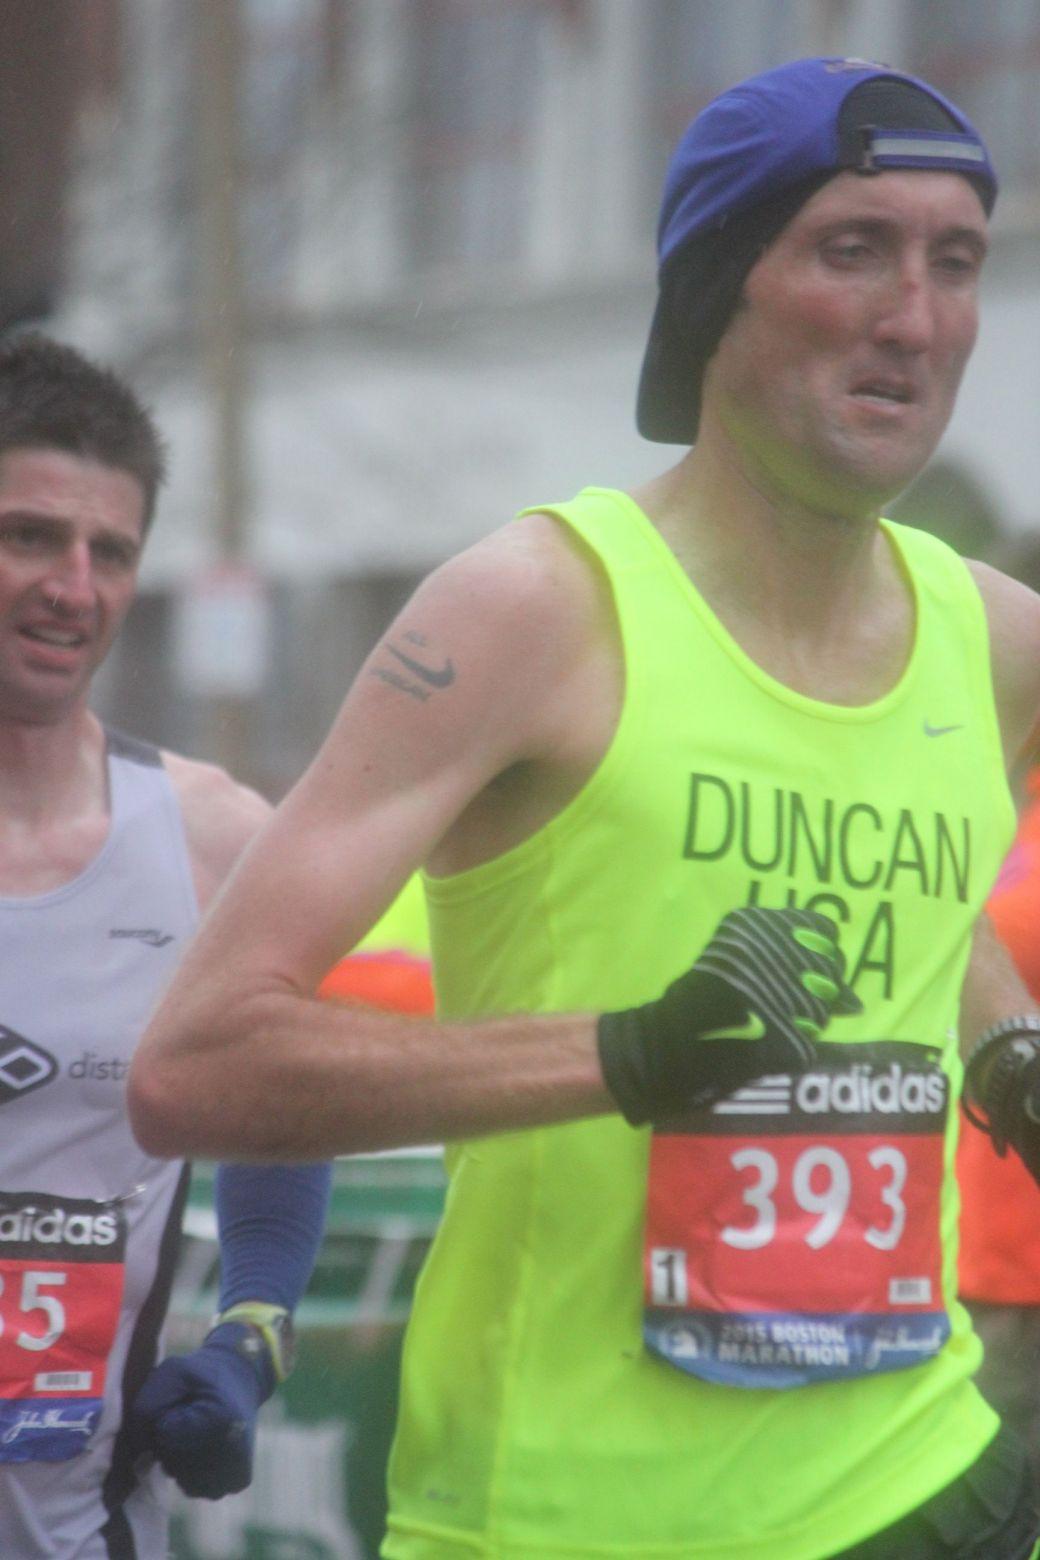 boston marathon april 20 2015 racer number 393